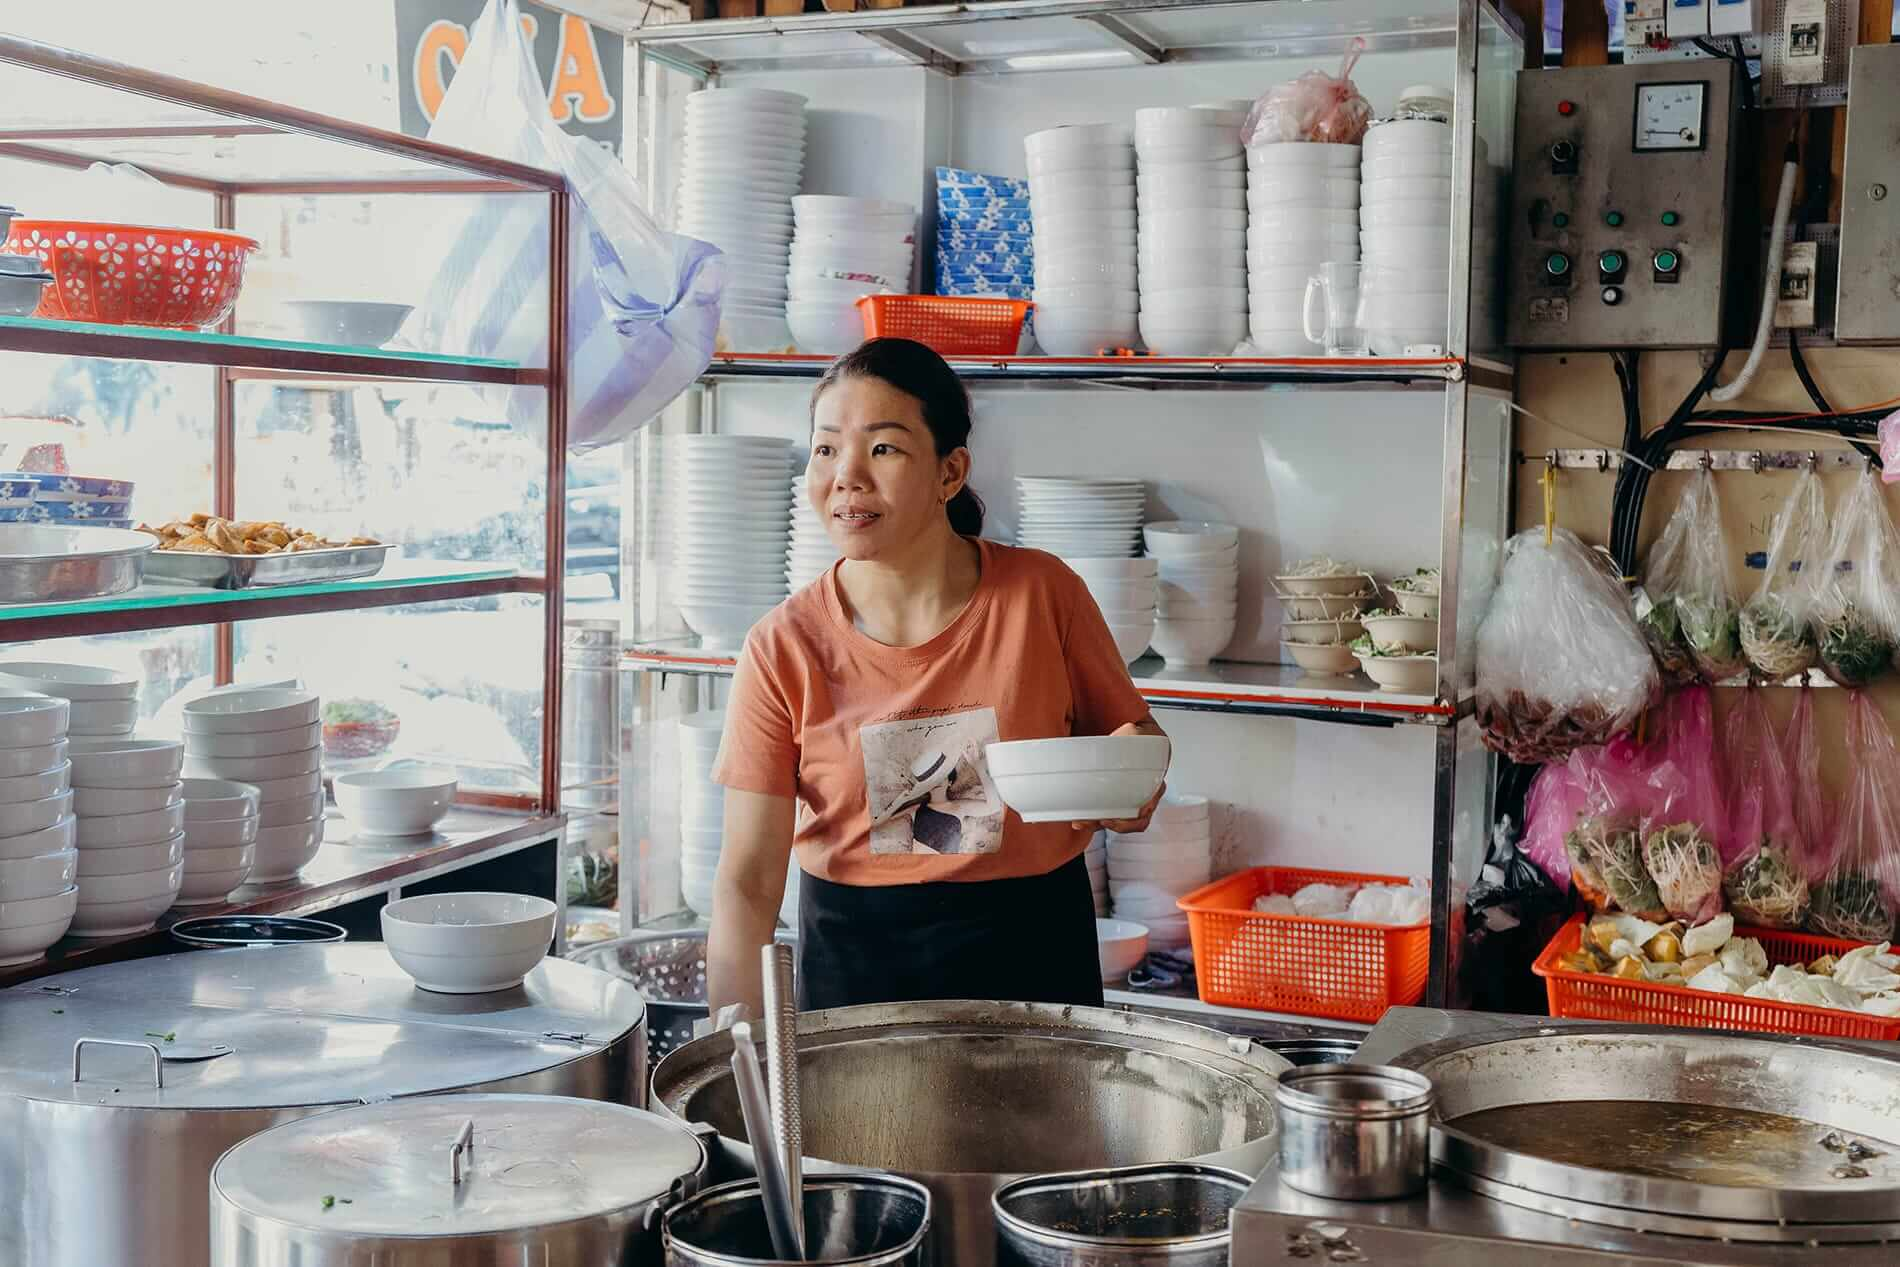 Vendor greets customers in her restaurant